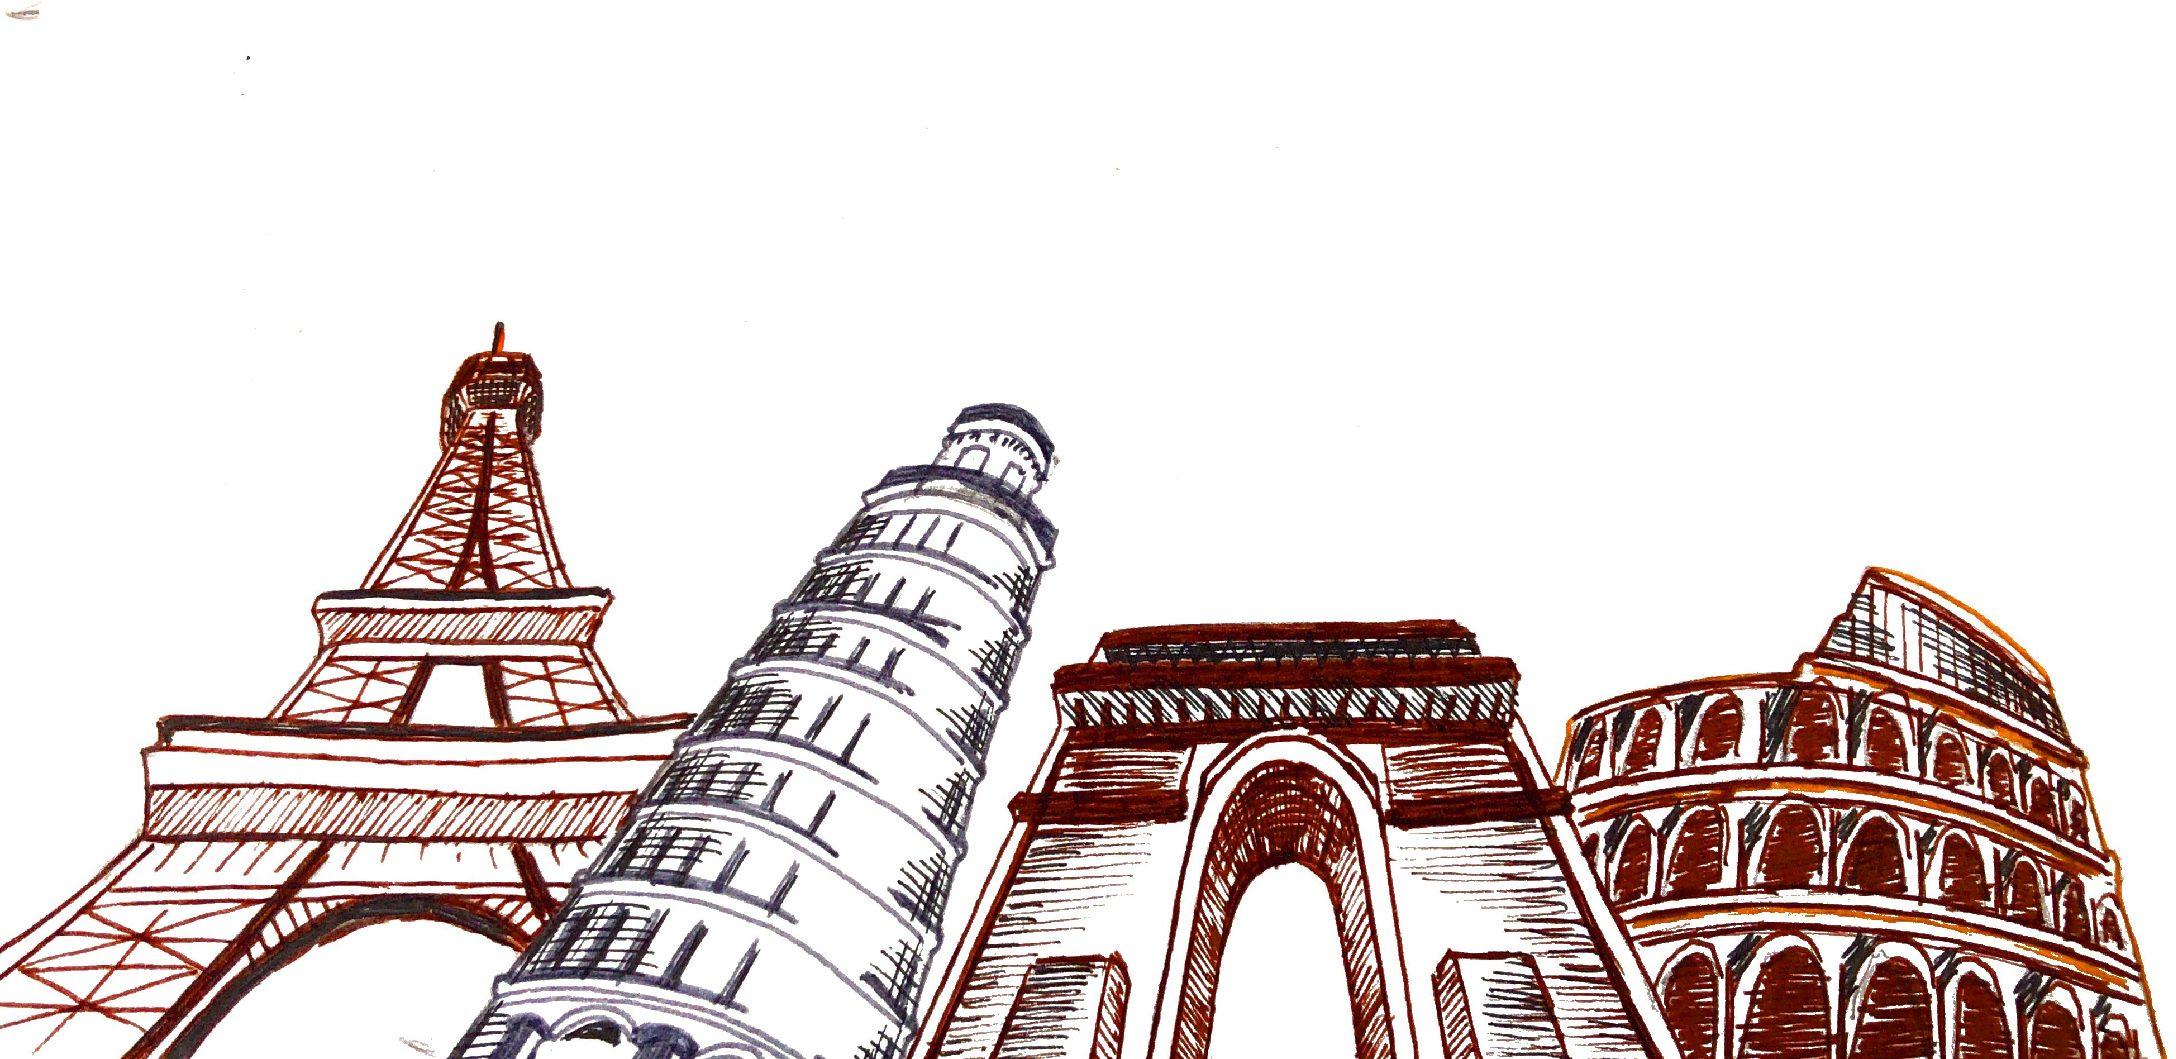 Various European landmarks in France and Italy. Illustration Credit: Loki Olin